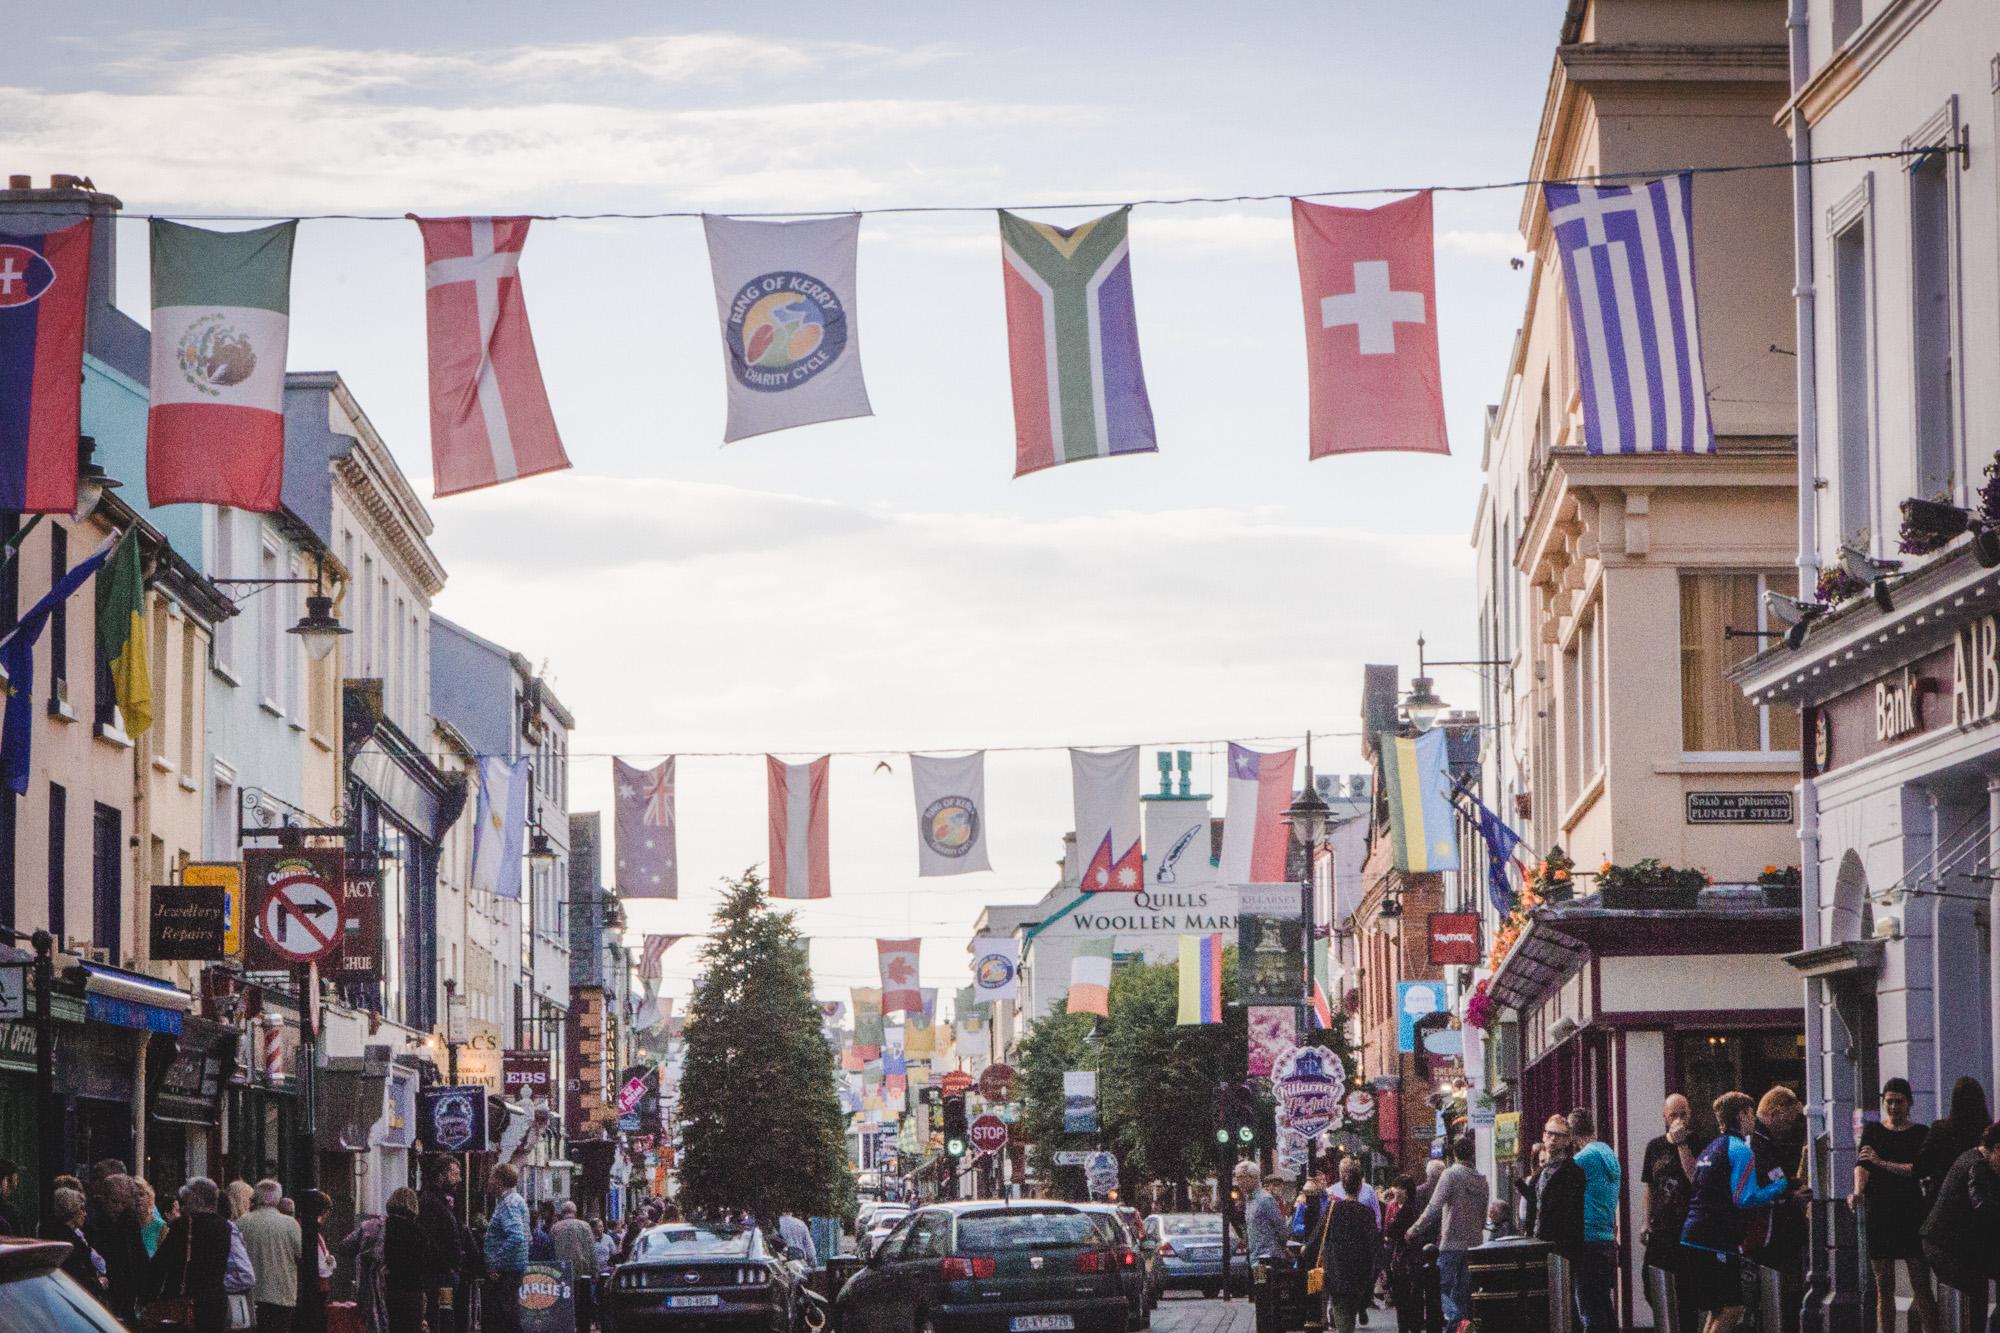 Flags in Killarney in Ireland